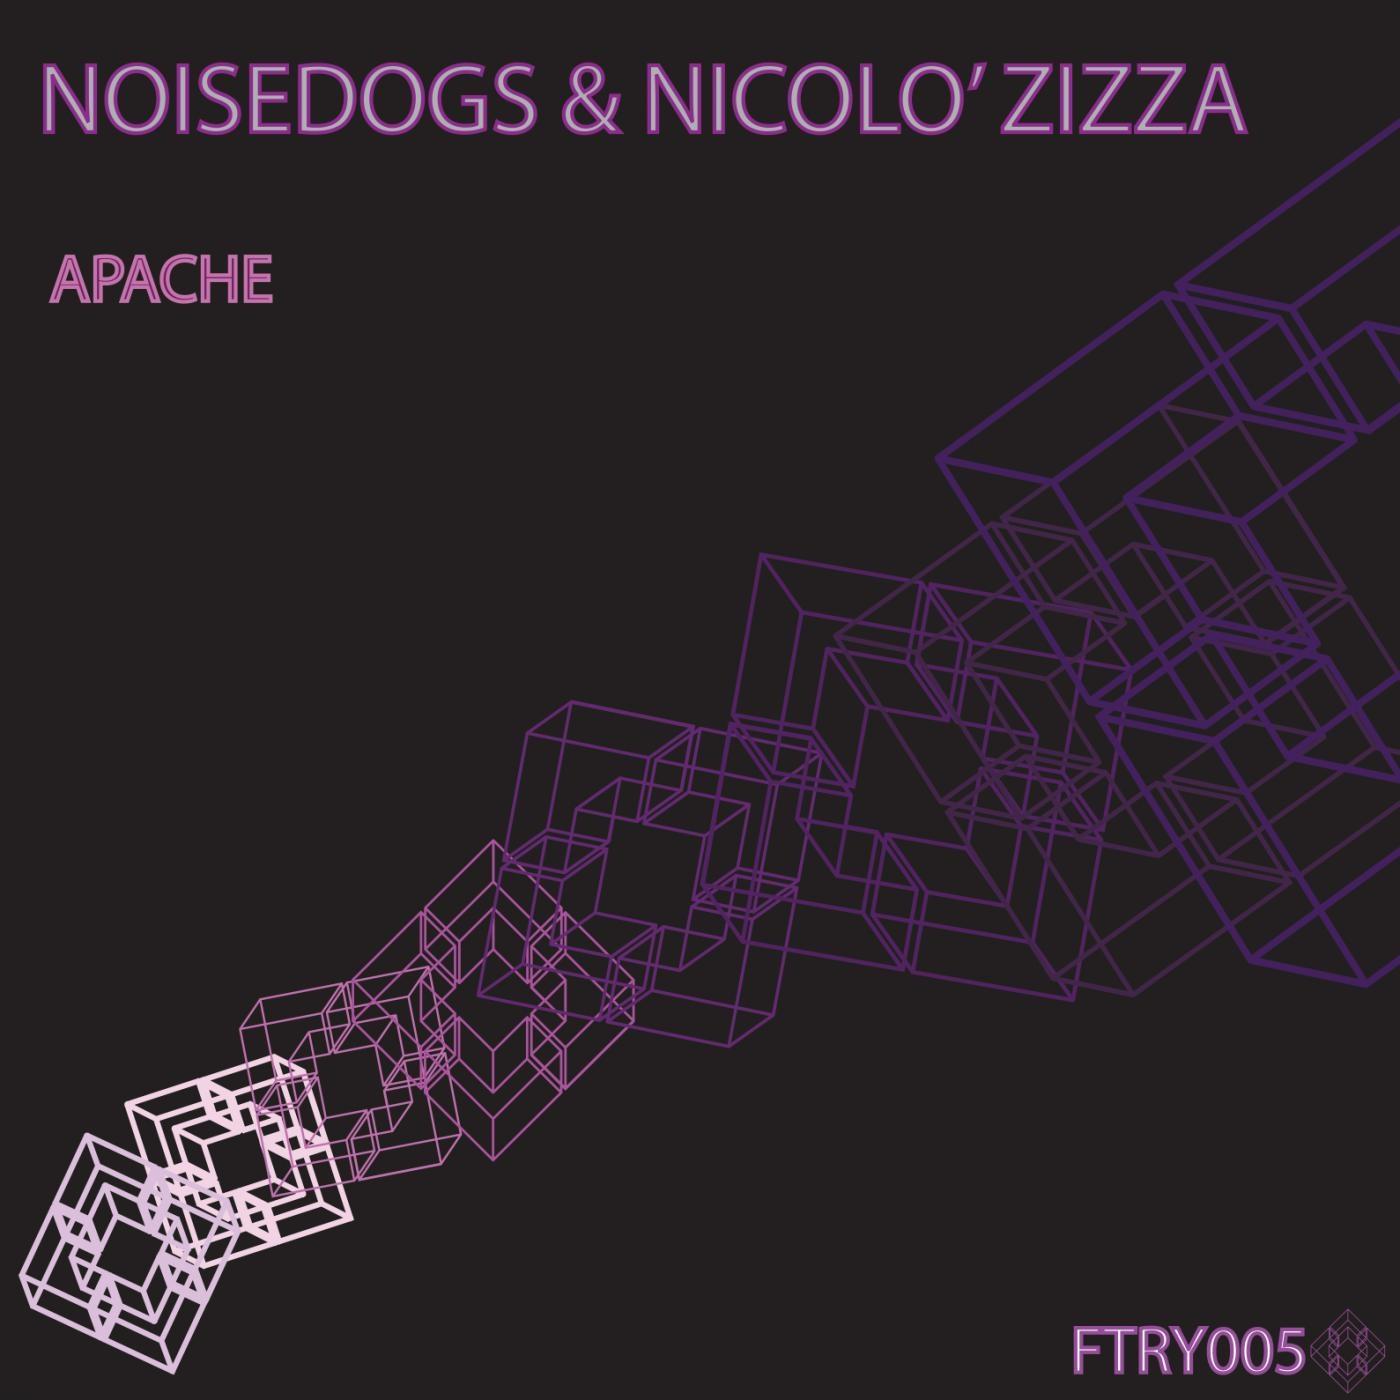 Noisedogs & Nicolo Zizza - Apache (Original mix)